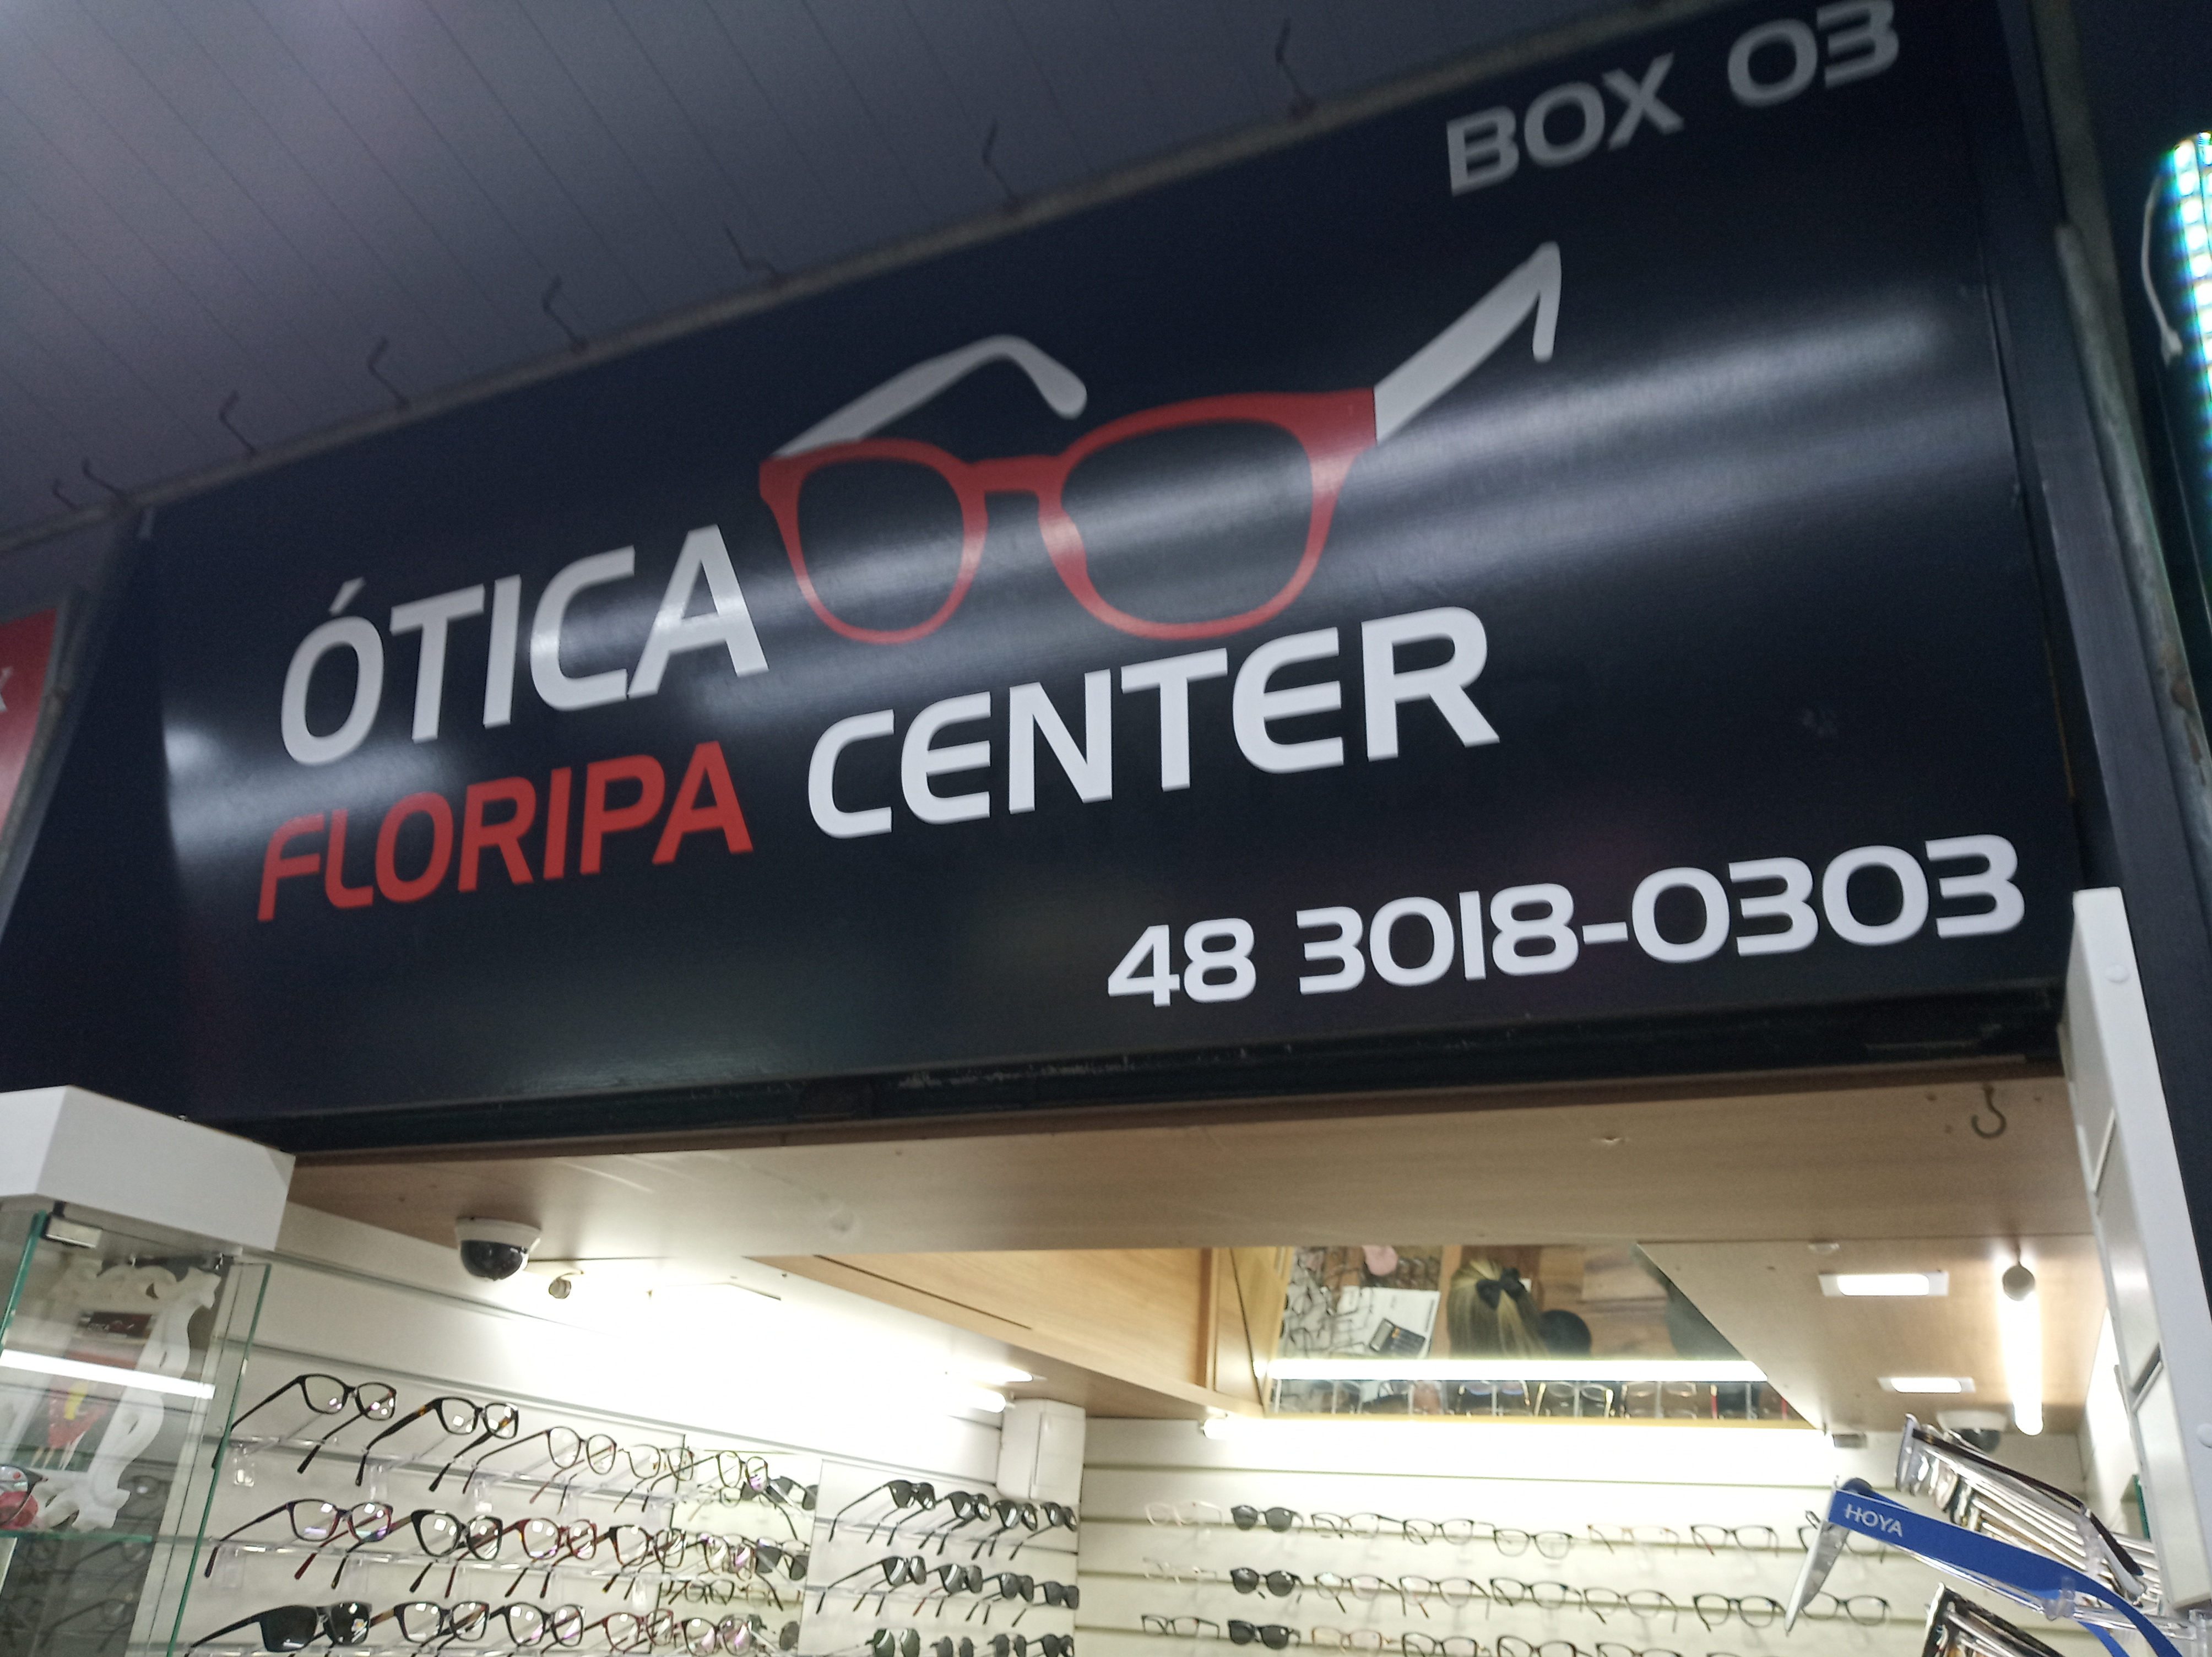 Floripa Center Otica 02